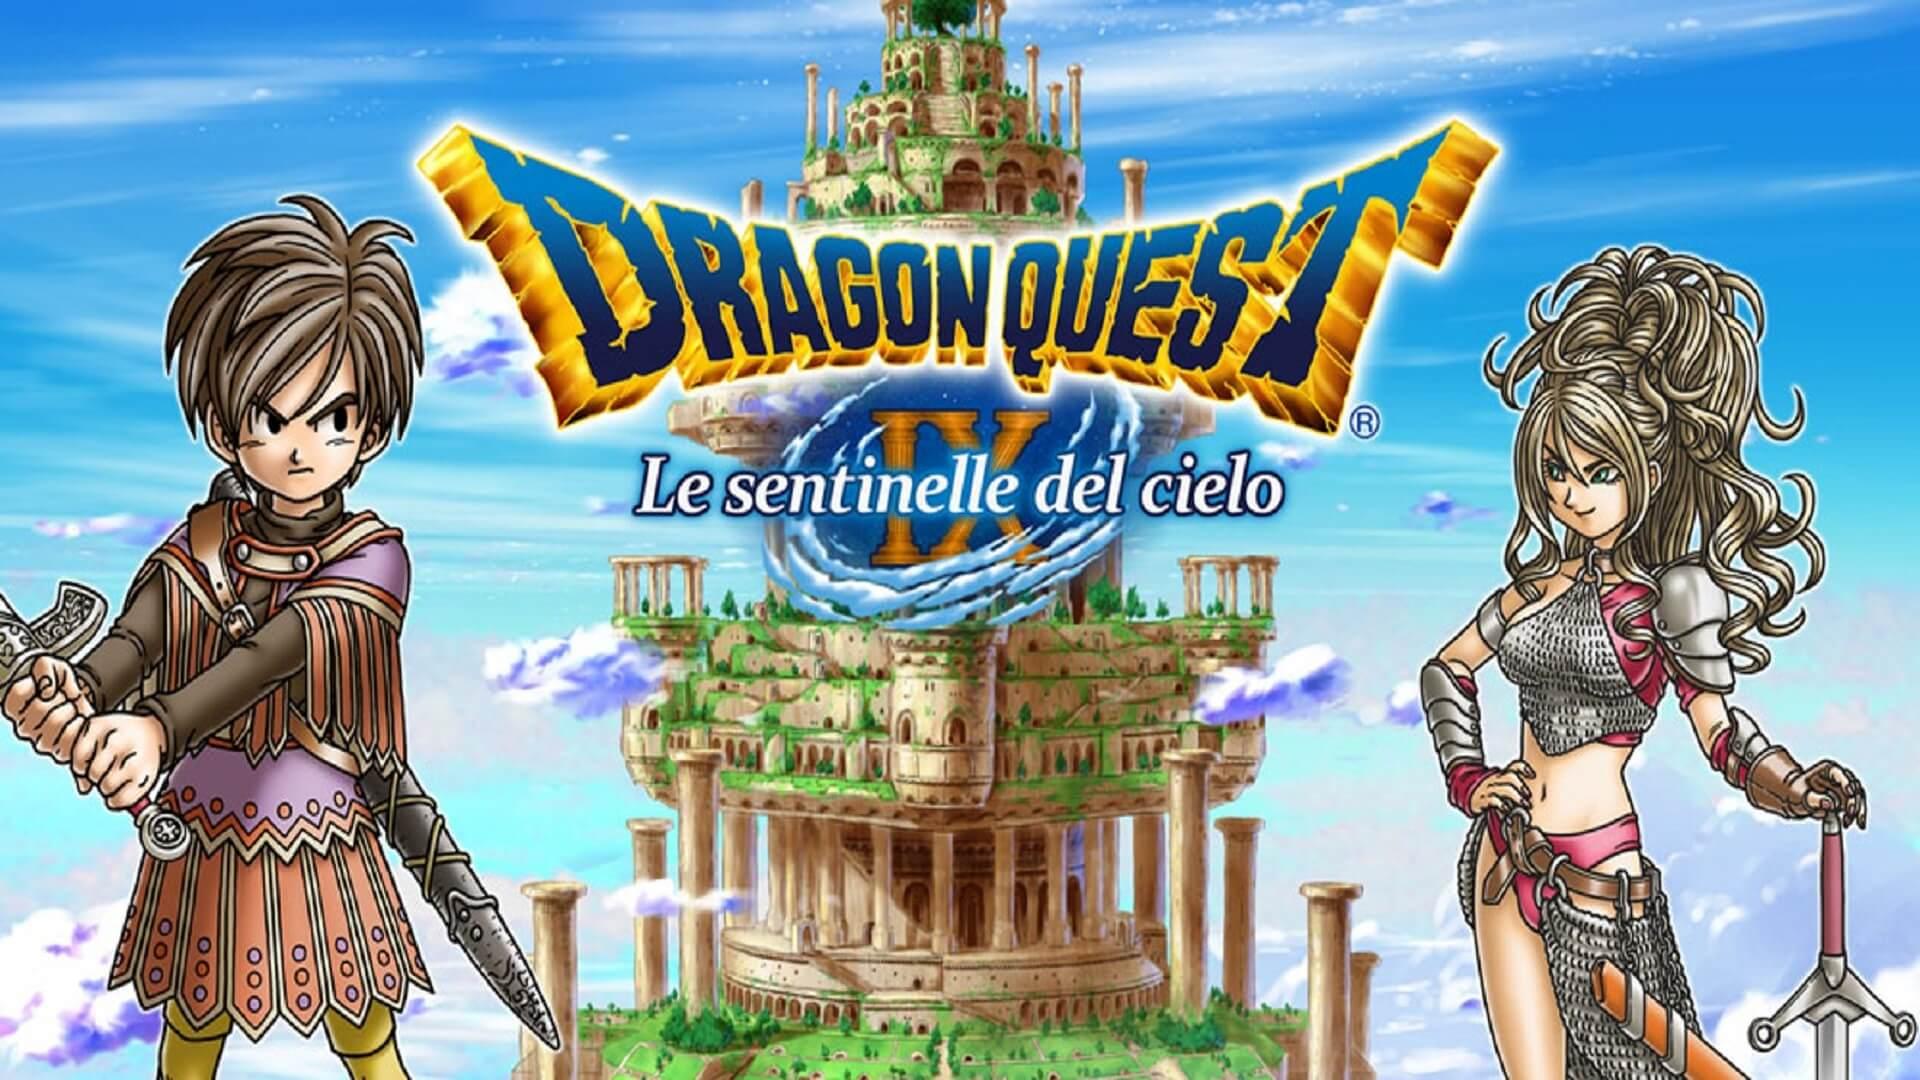 Dragon Quest IX Le sentinelle del cielo